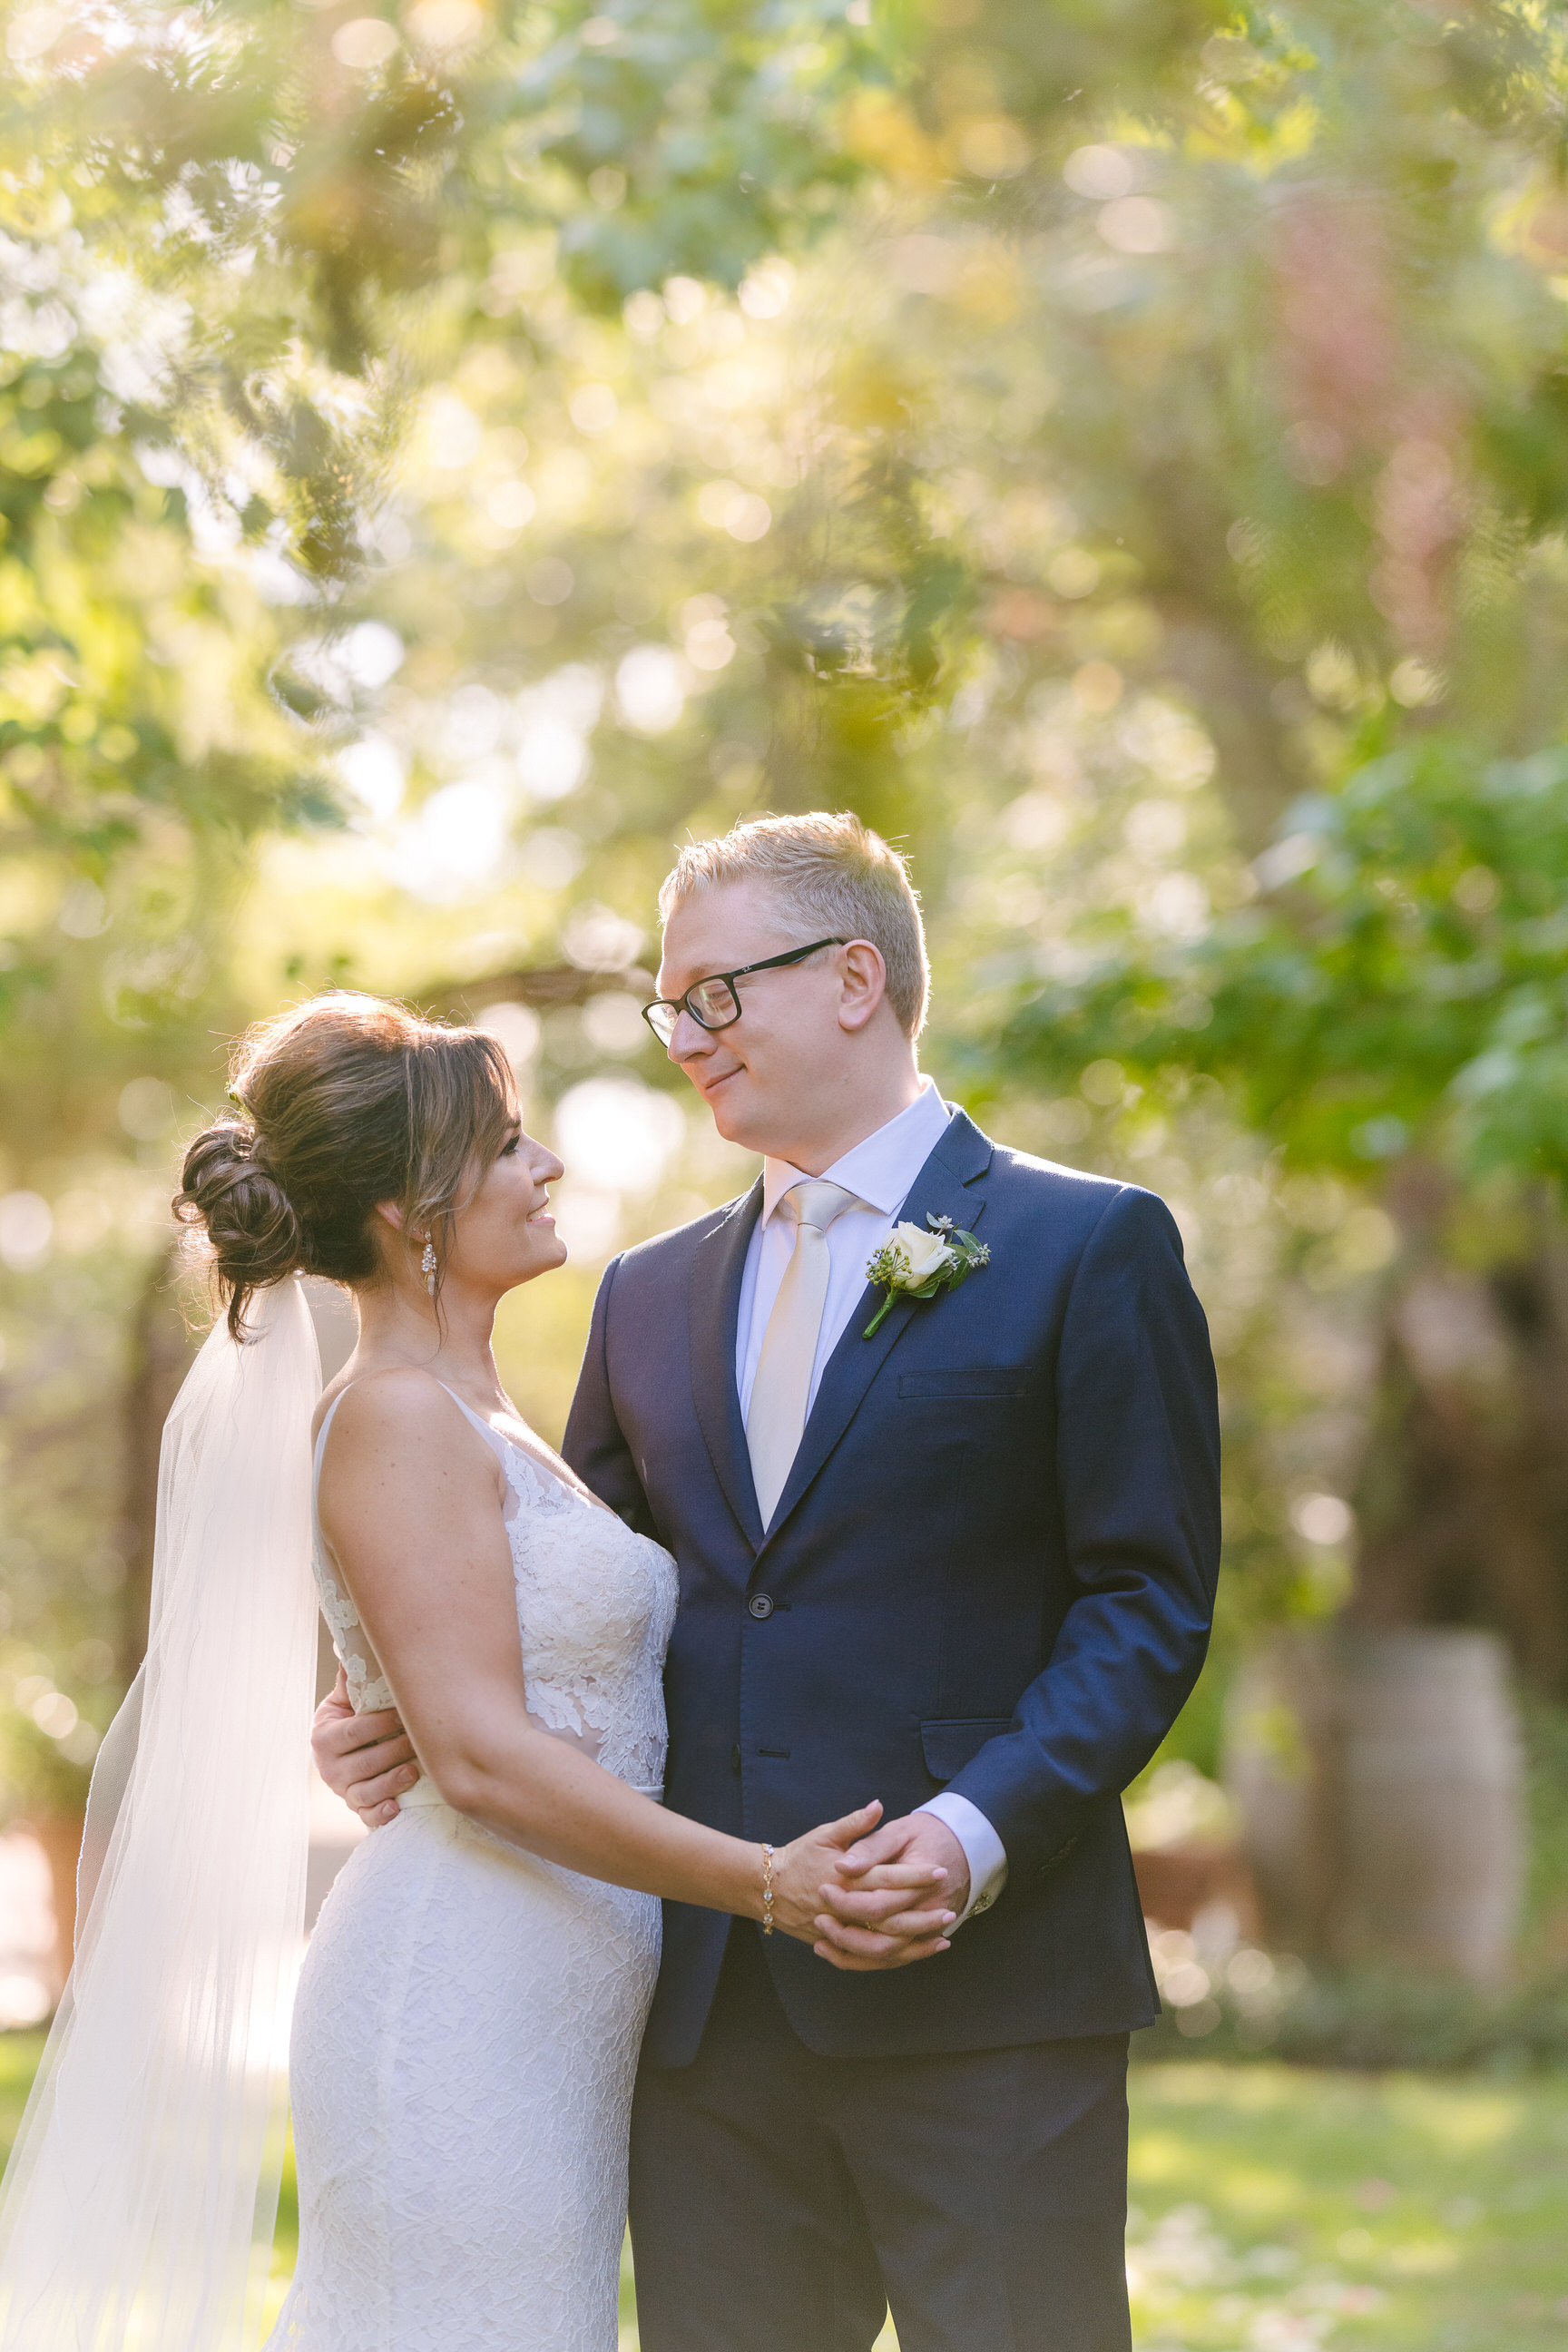 Justin_And_Jim_Photography_Chateau_Dore_Bendigo_Wedding55.JPG